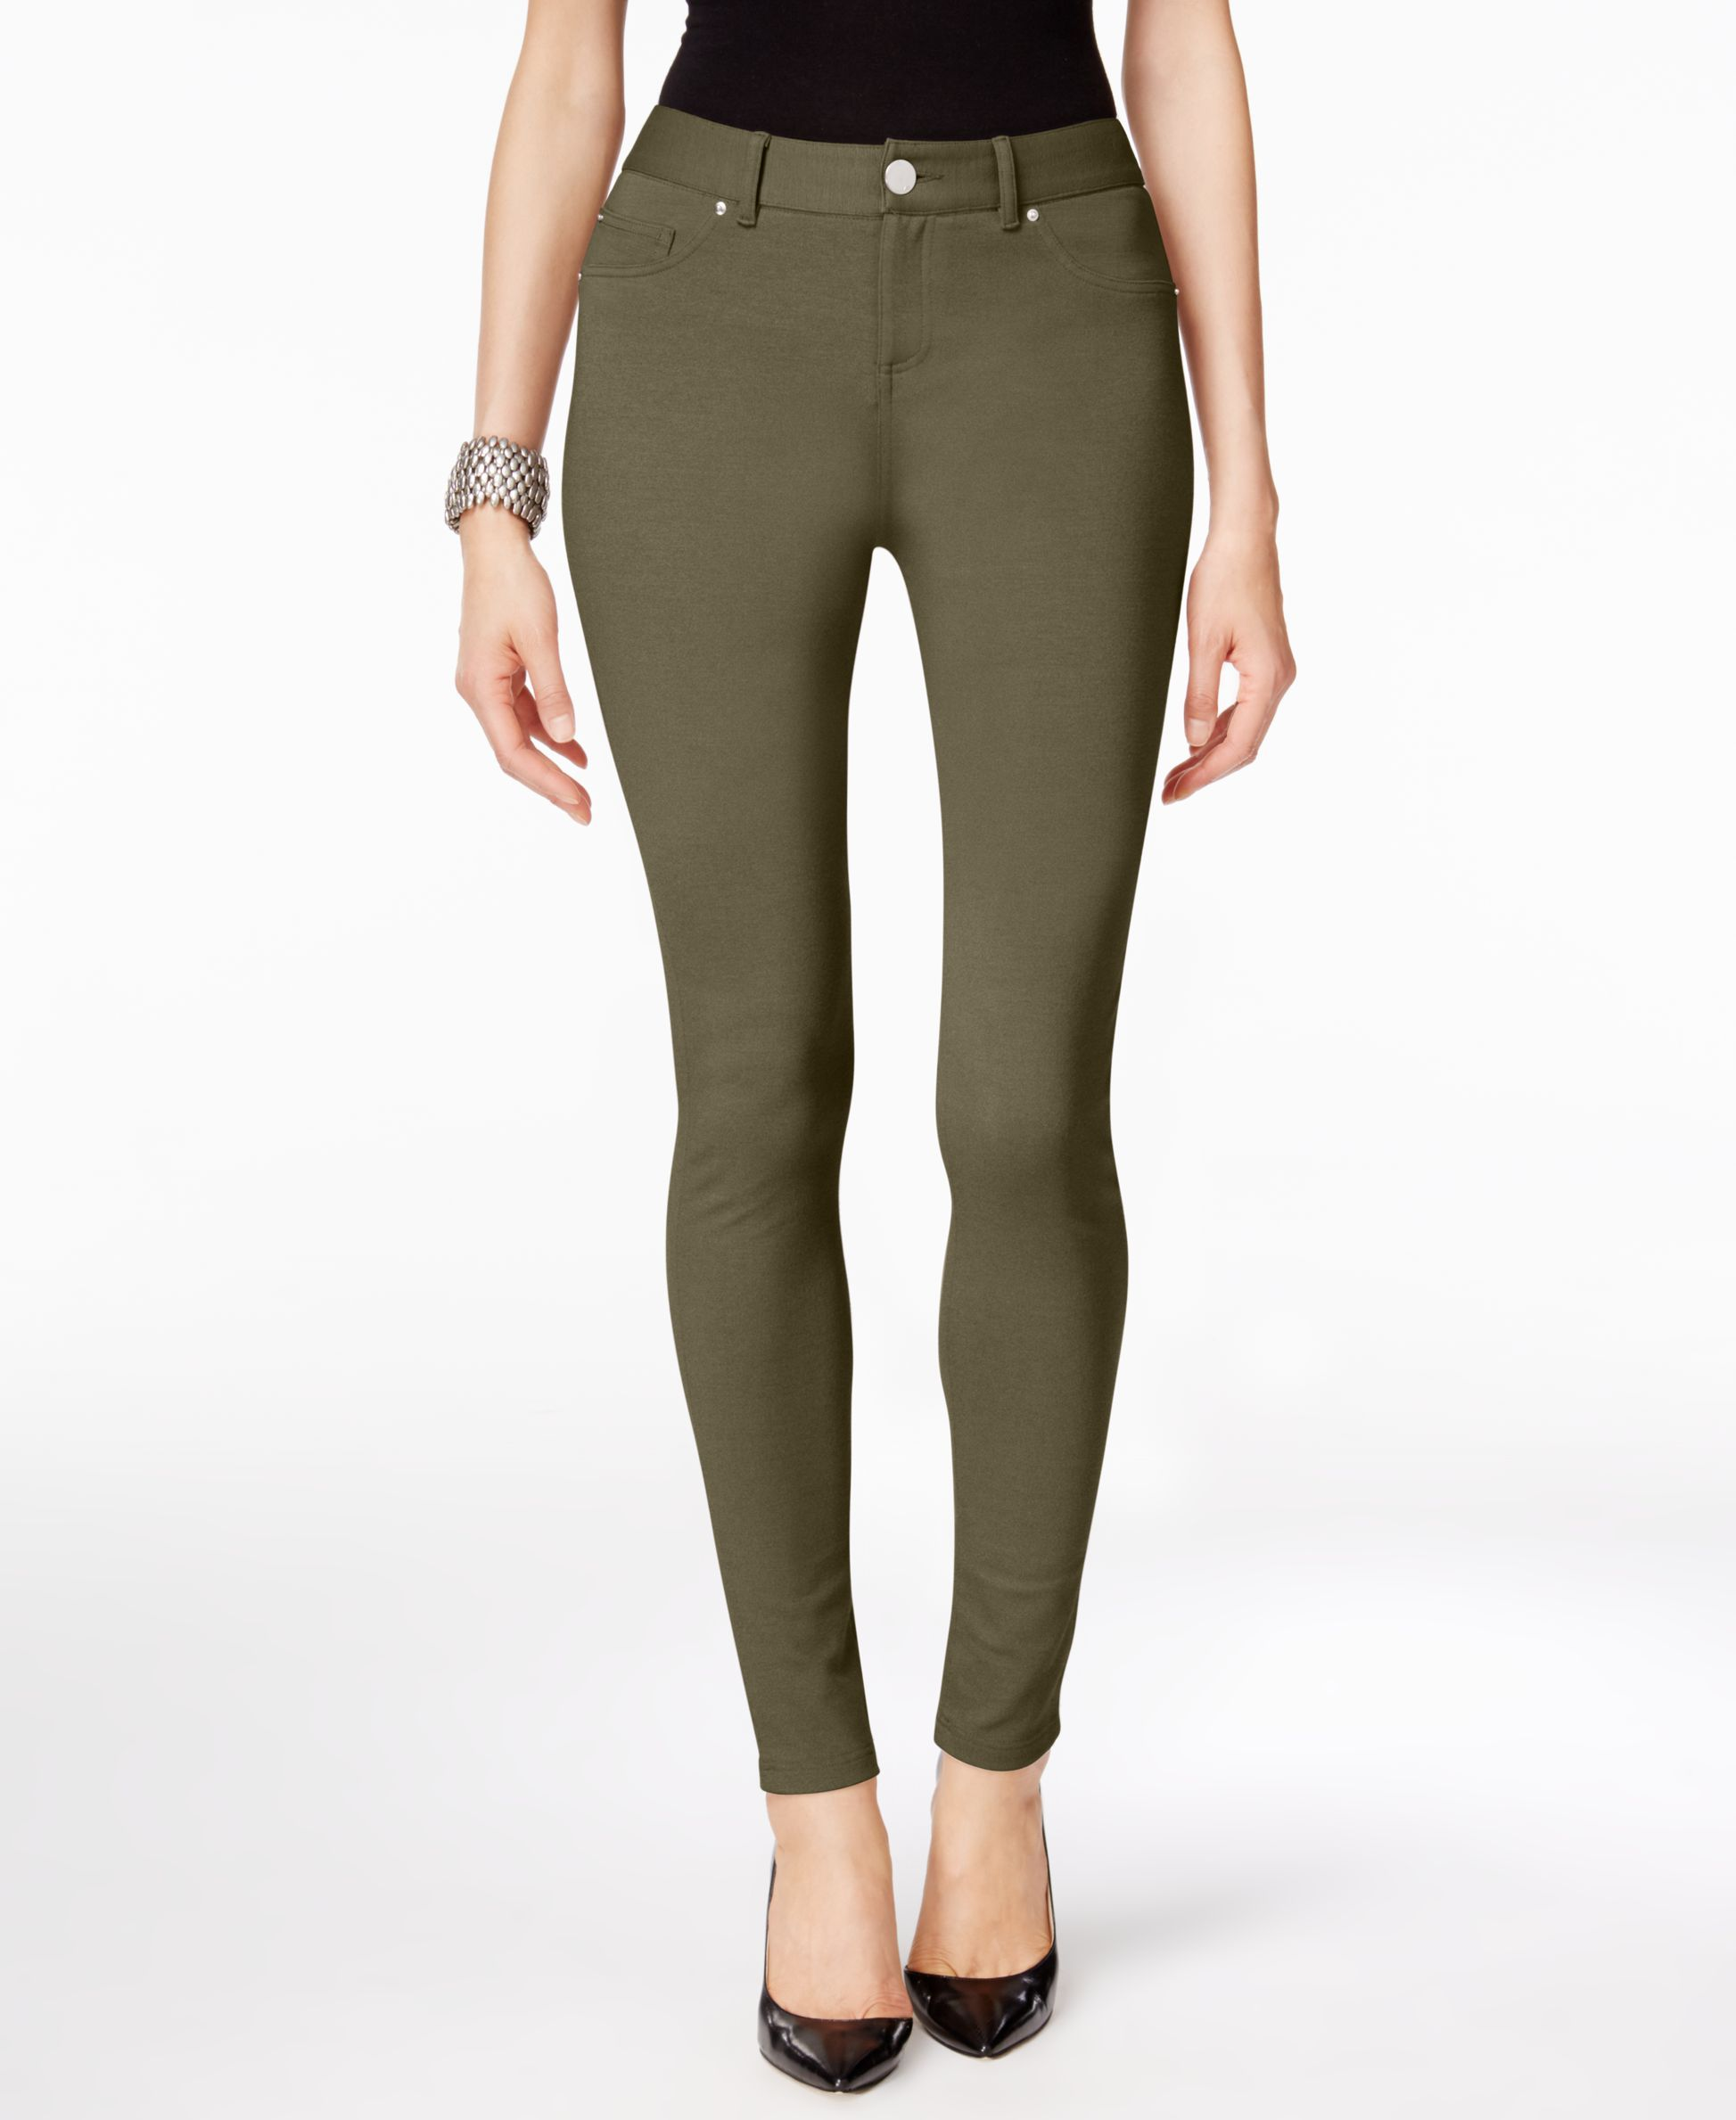 ac3a81f1fa97f Inc International Concepts Skinny-Fit Ponte Pants